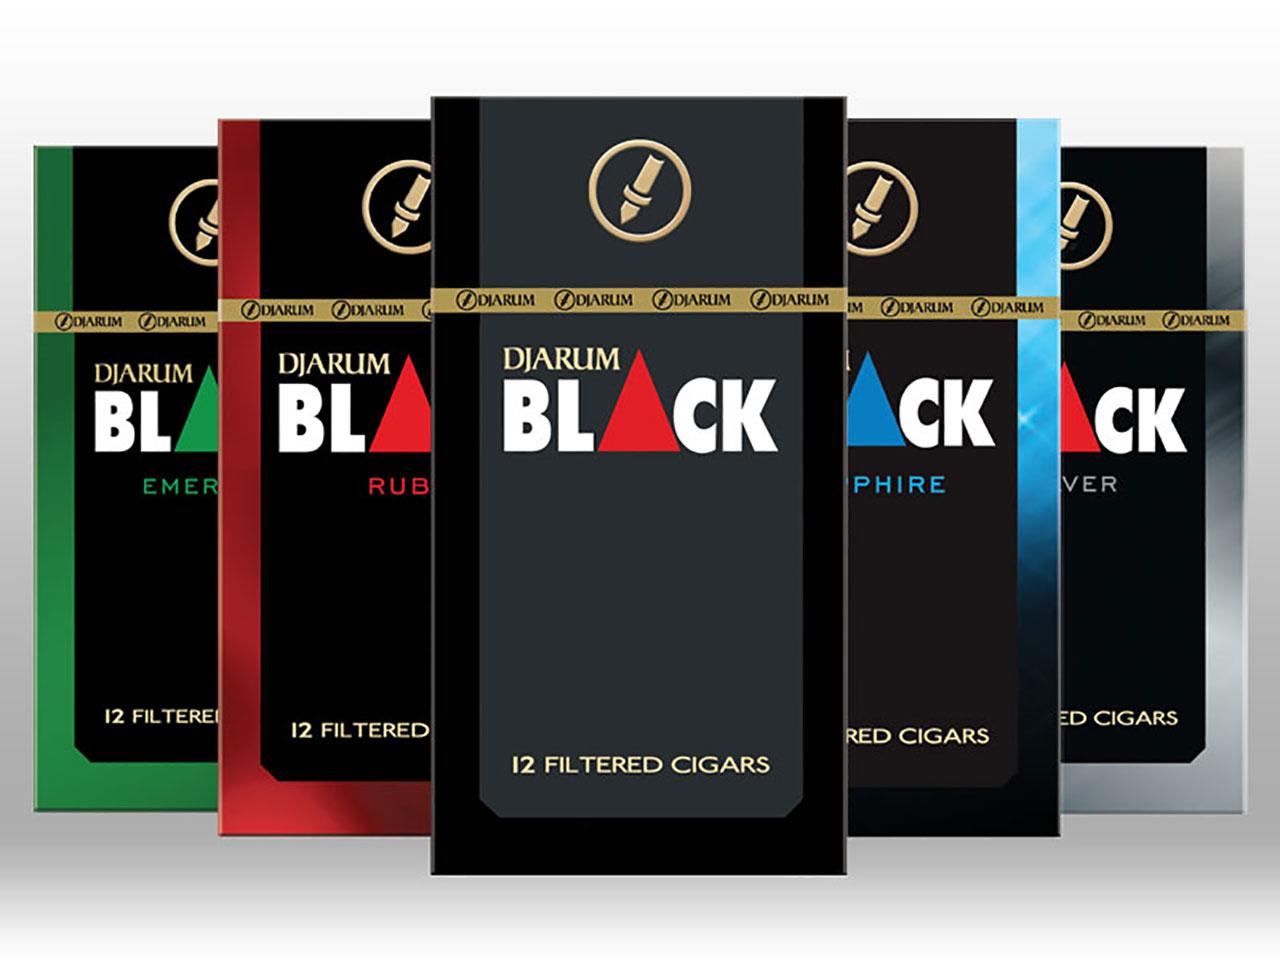 Djarum Black Cigars